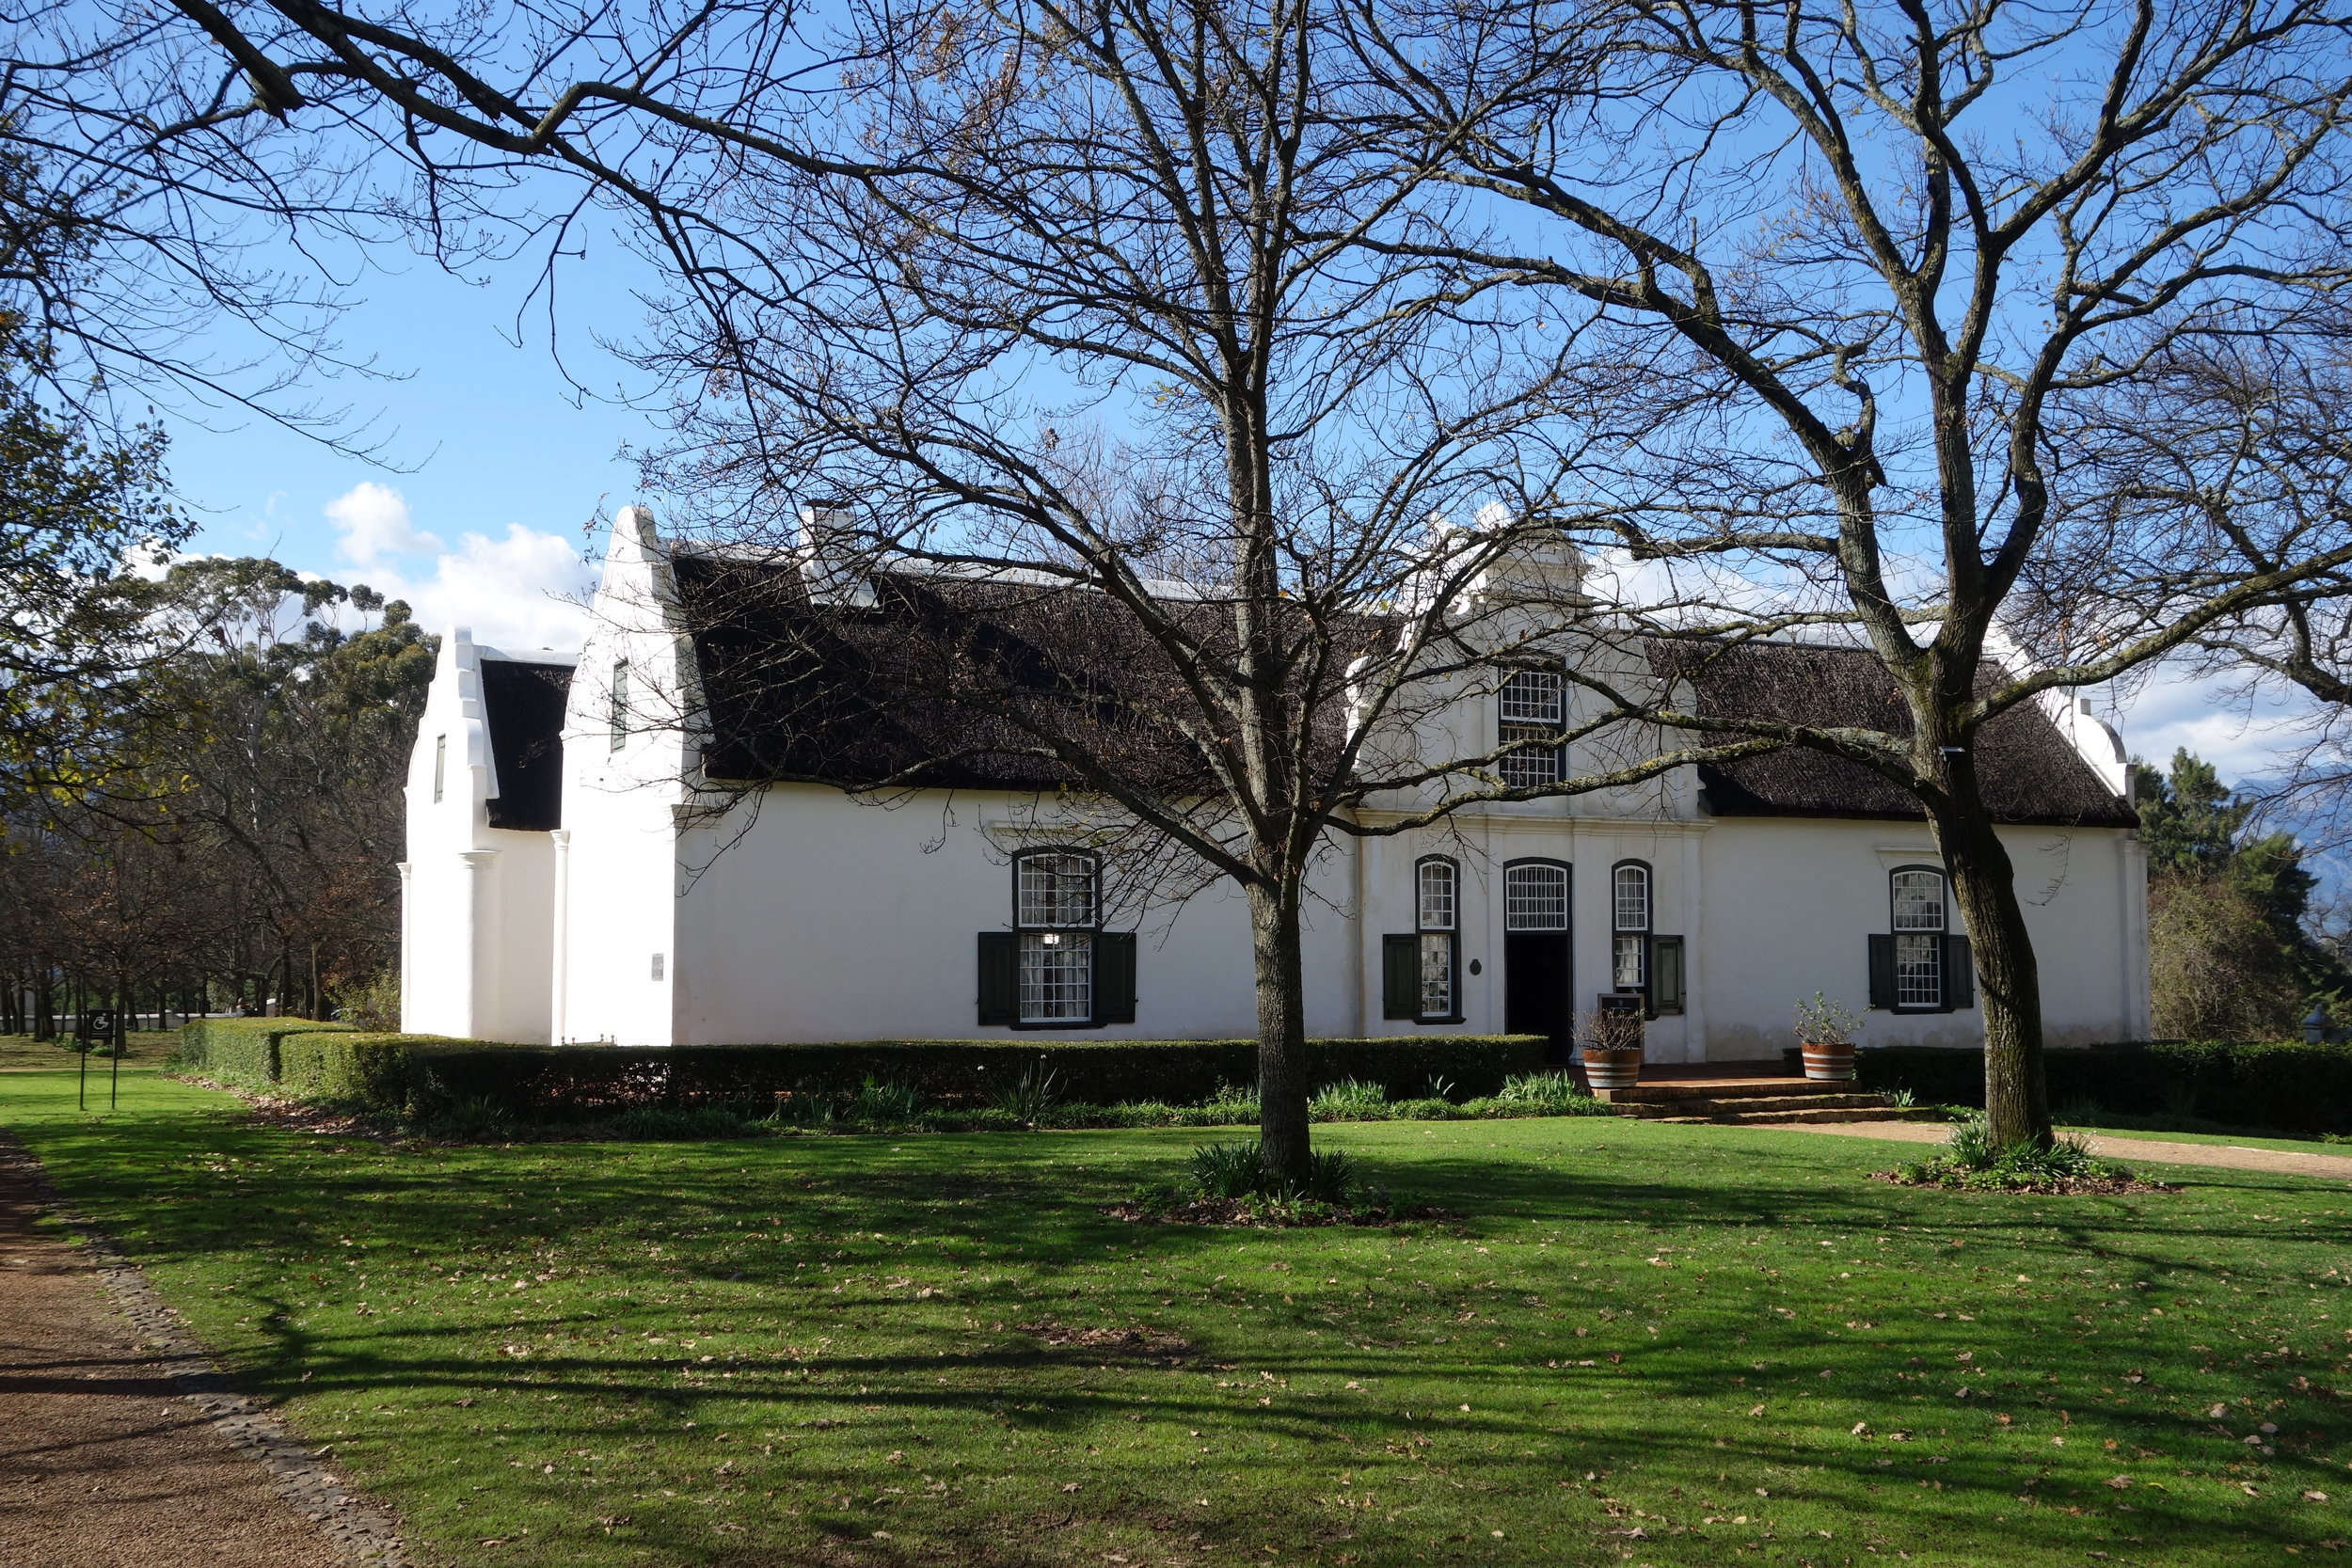 Free lunch at Boschendal Wine Estate. It's summer in Cape Town's Stellenbosch wine area.